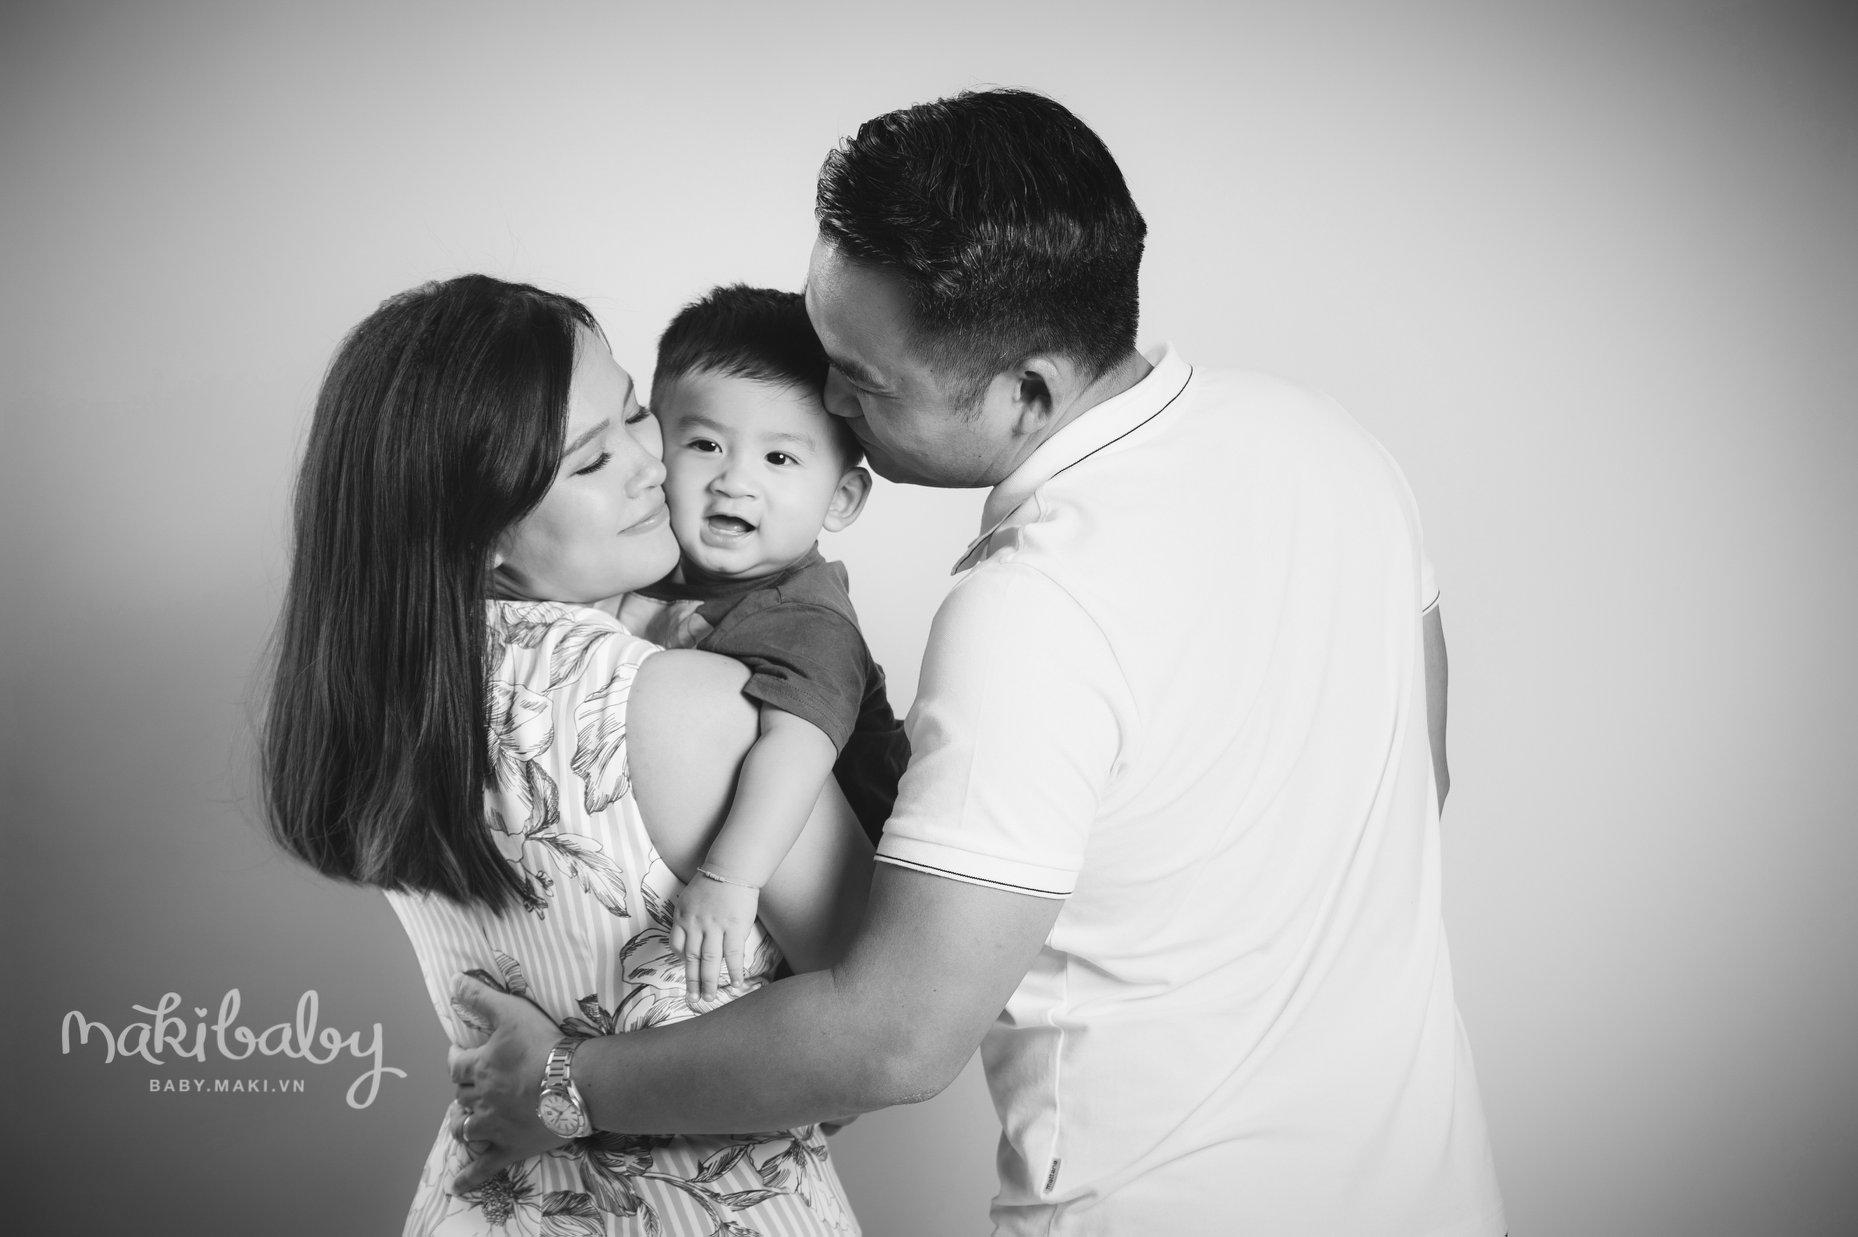 Chụp ảnh gia đình. ẢNh: MAKI Studio